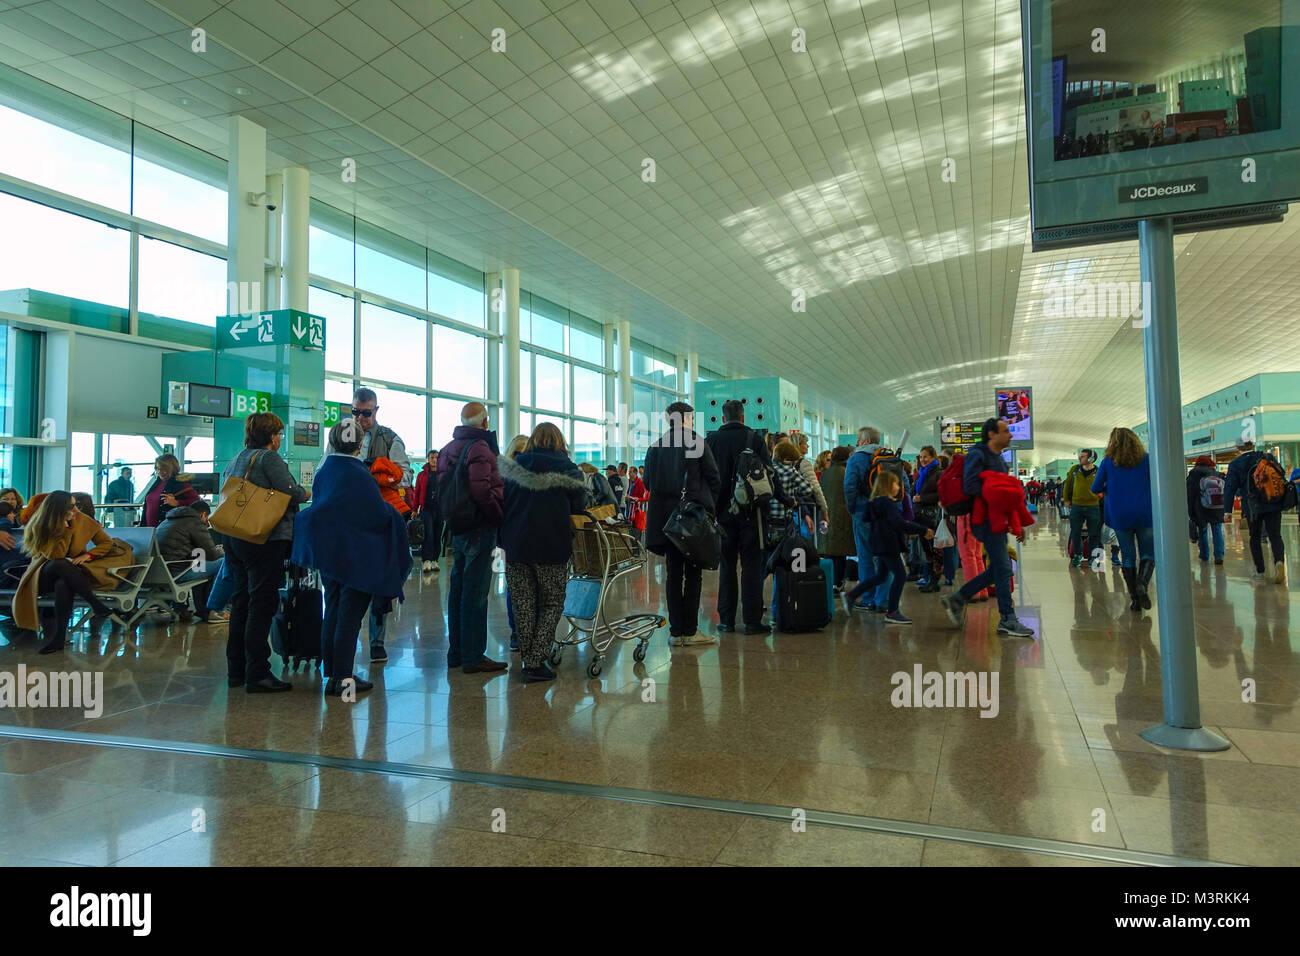 Barcelona El Prat airport with people queueing - Stock Image